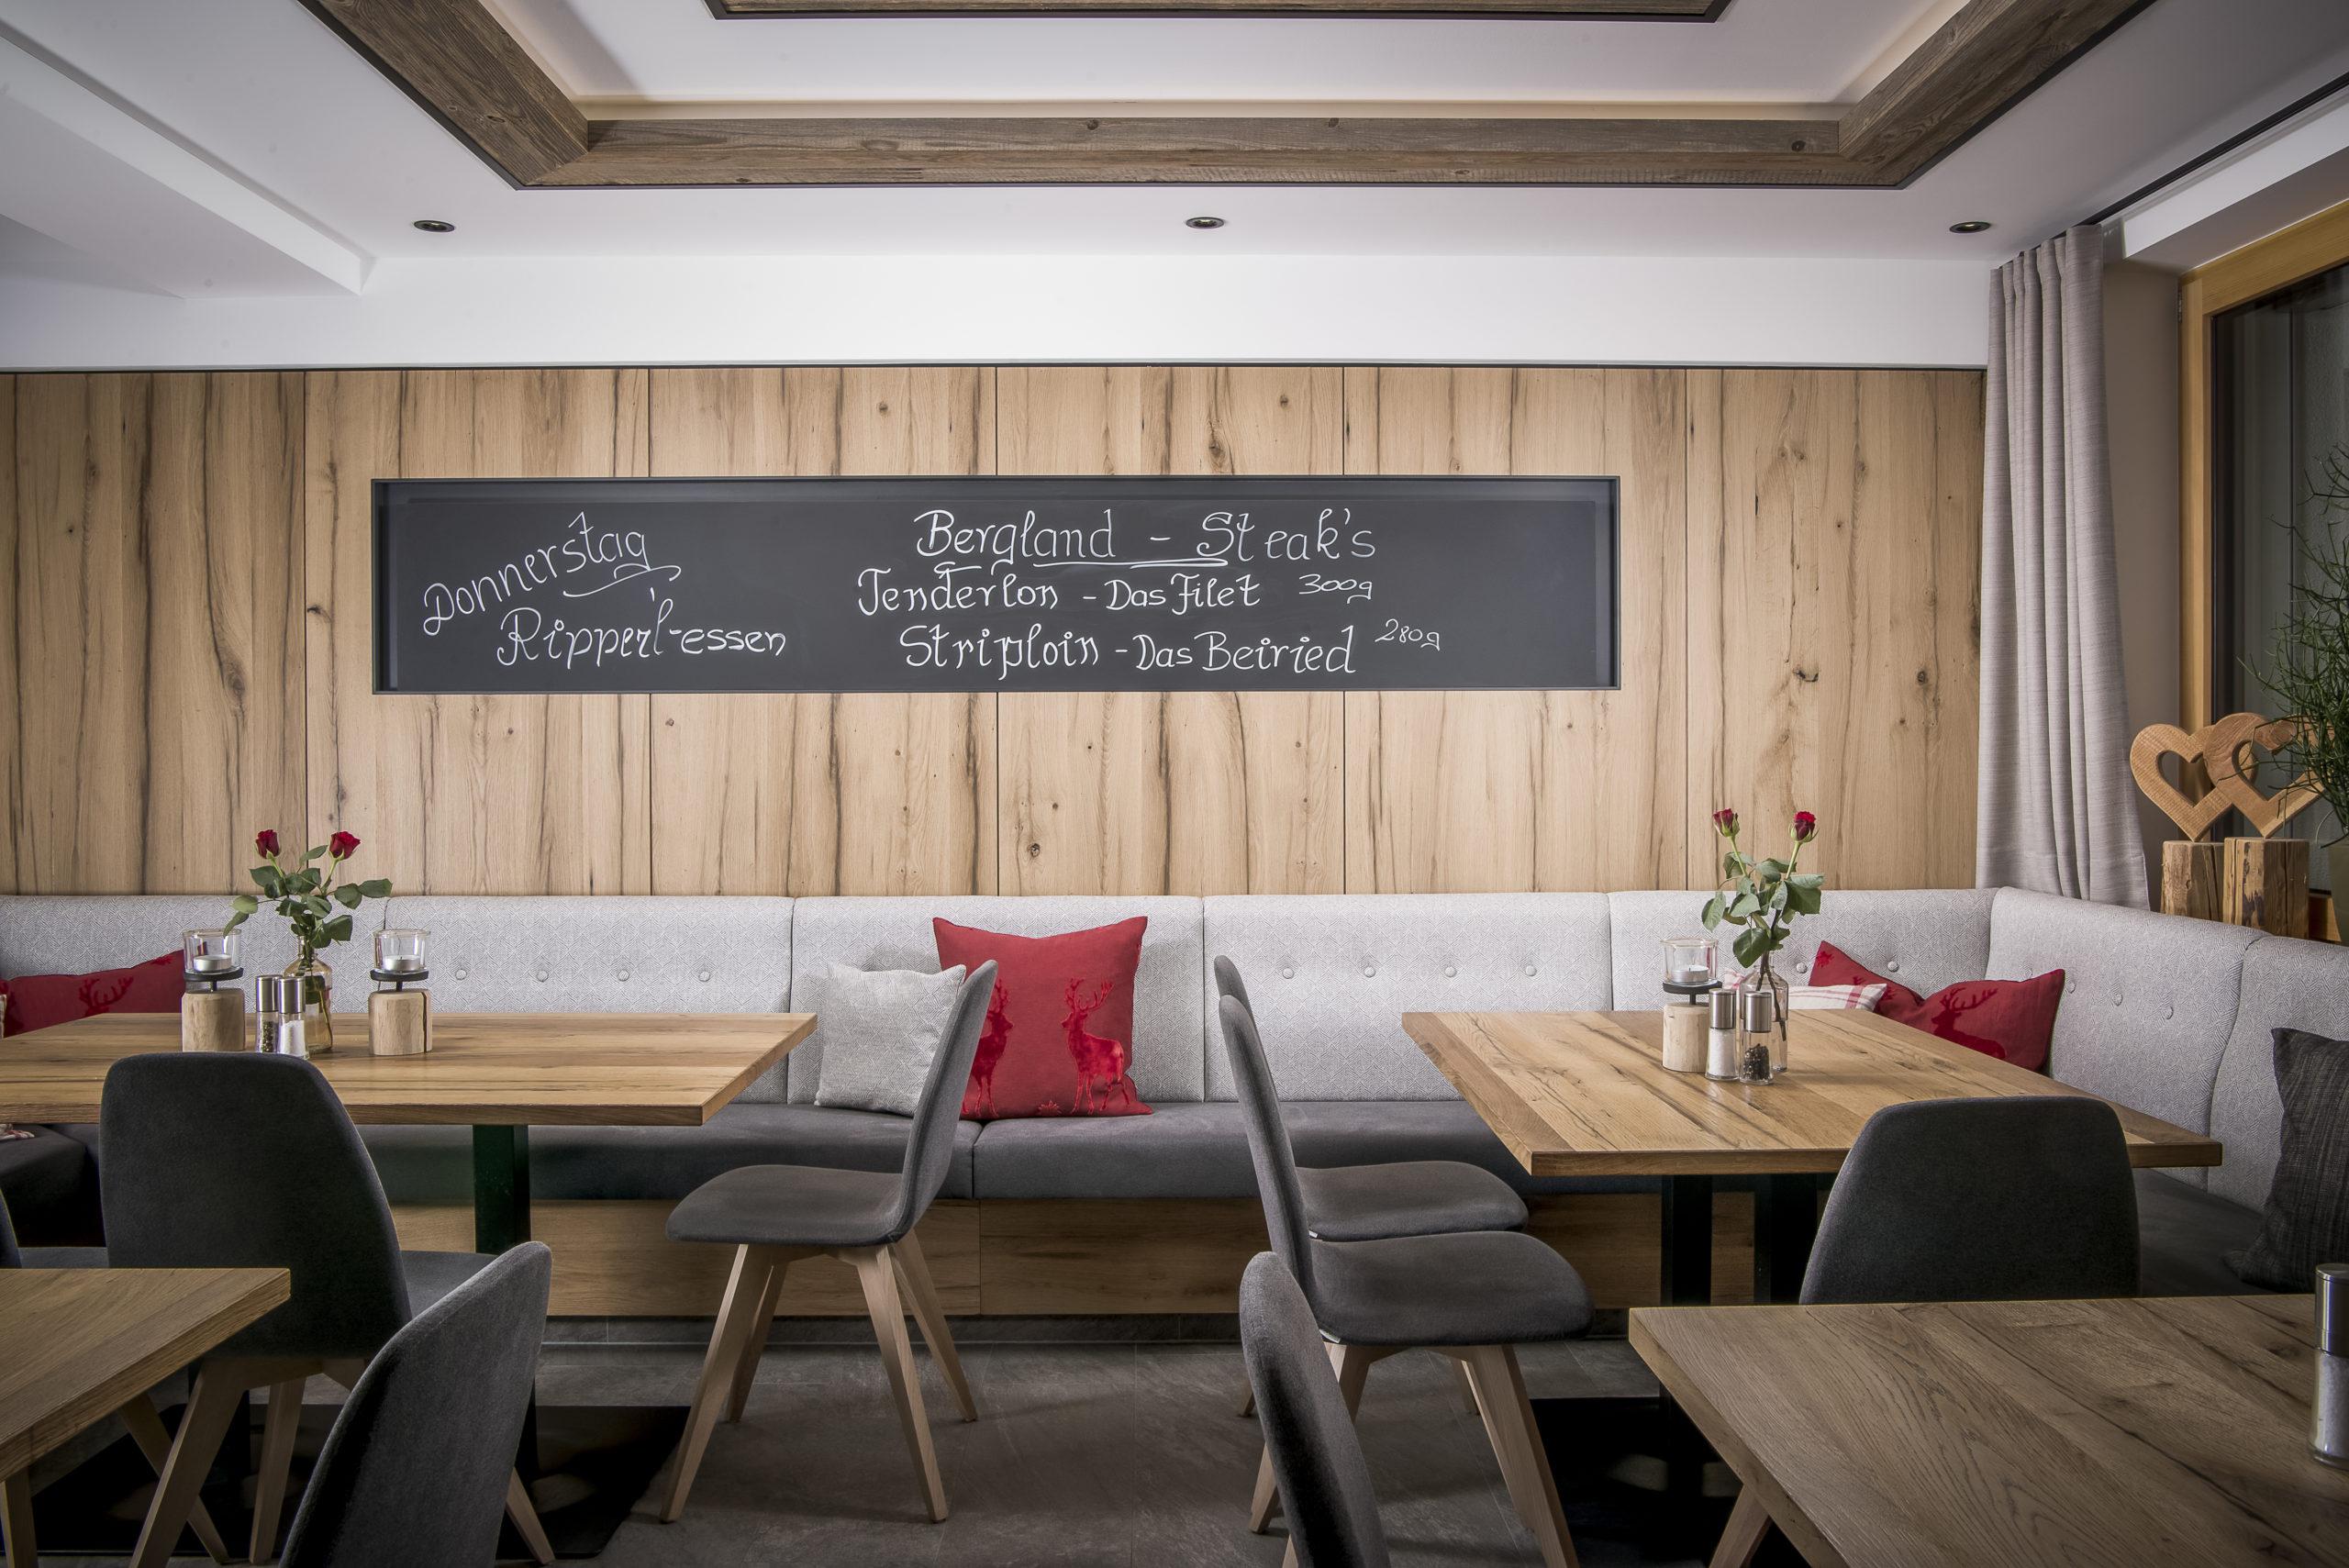 Bergland_Ellmau_Tirol_Restaurant_innen_6